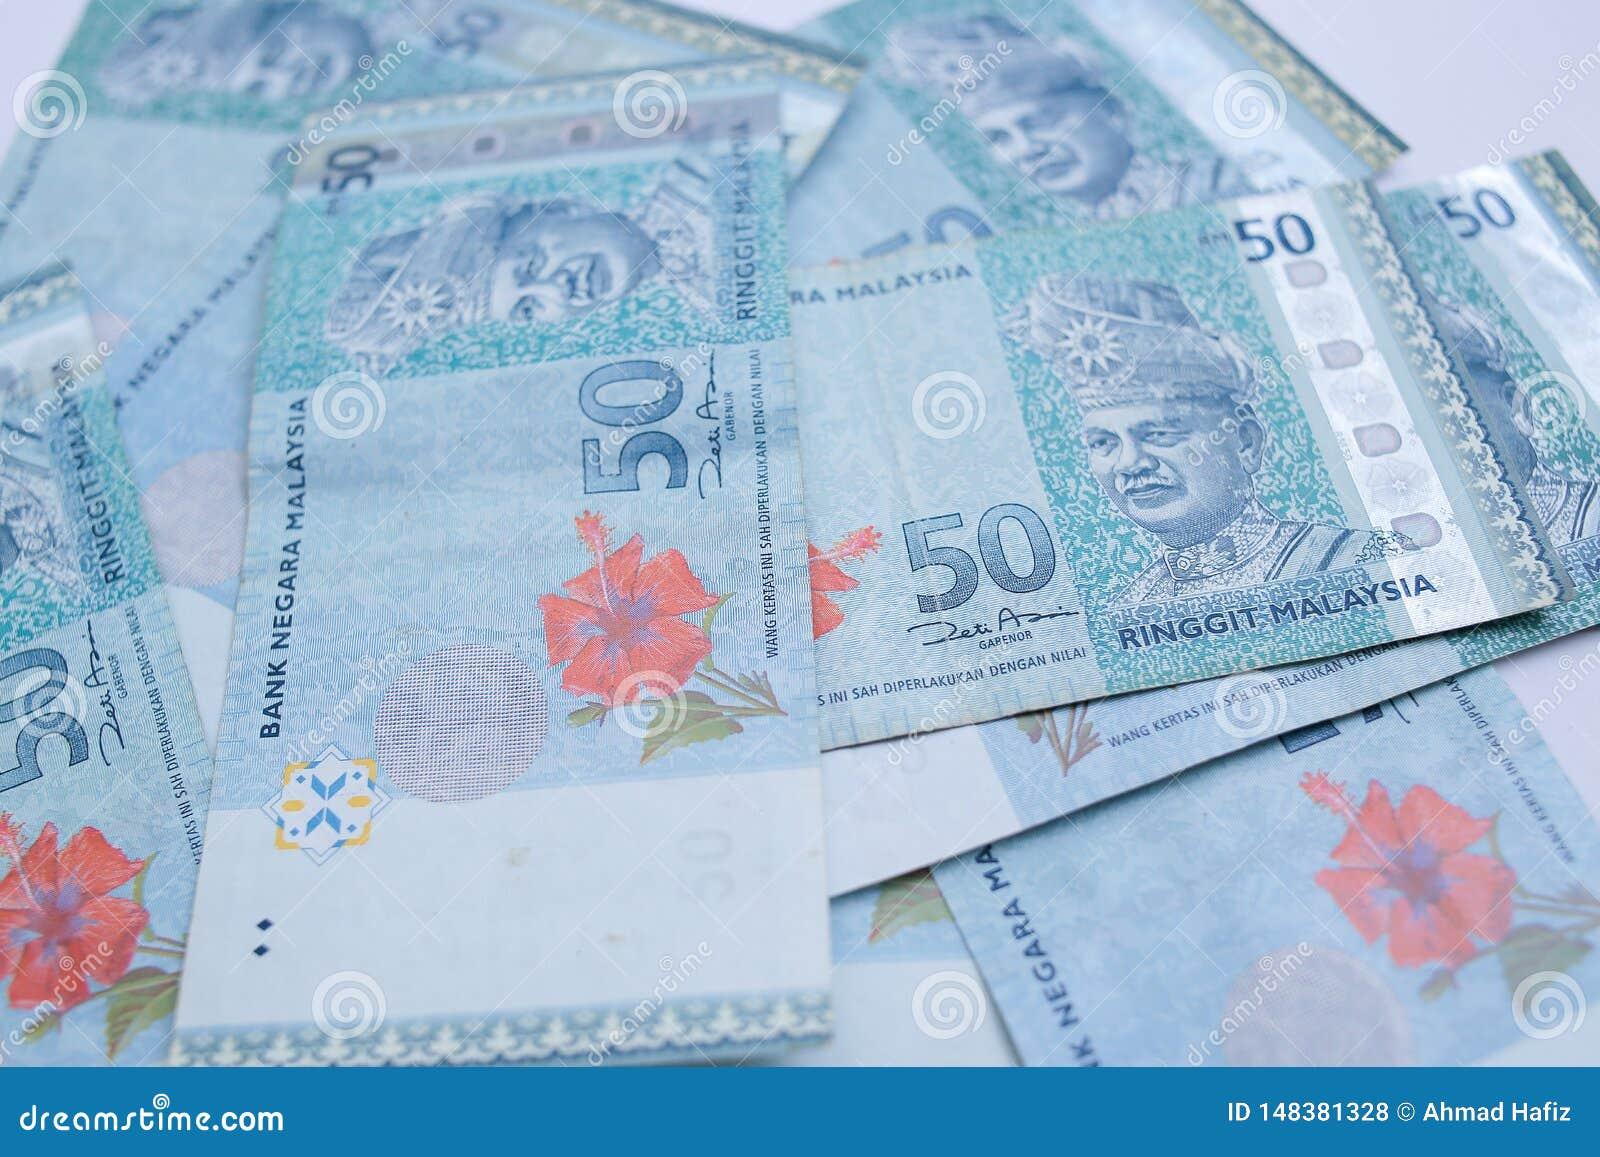 50-Ringgit-Banknote Ringgit ist die Landesw?hrung von Malaysia